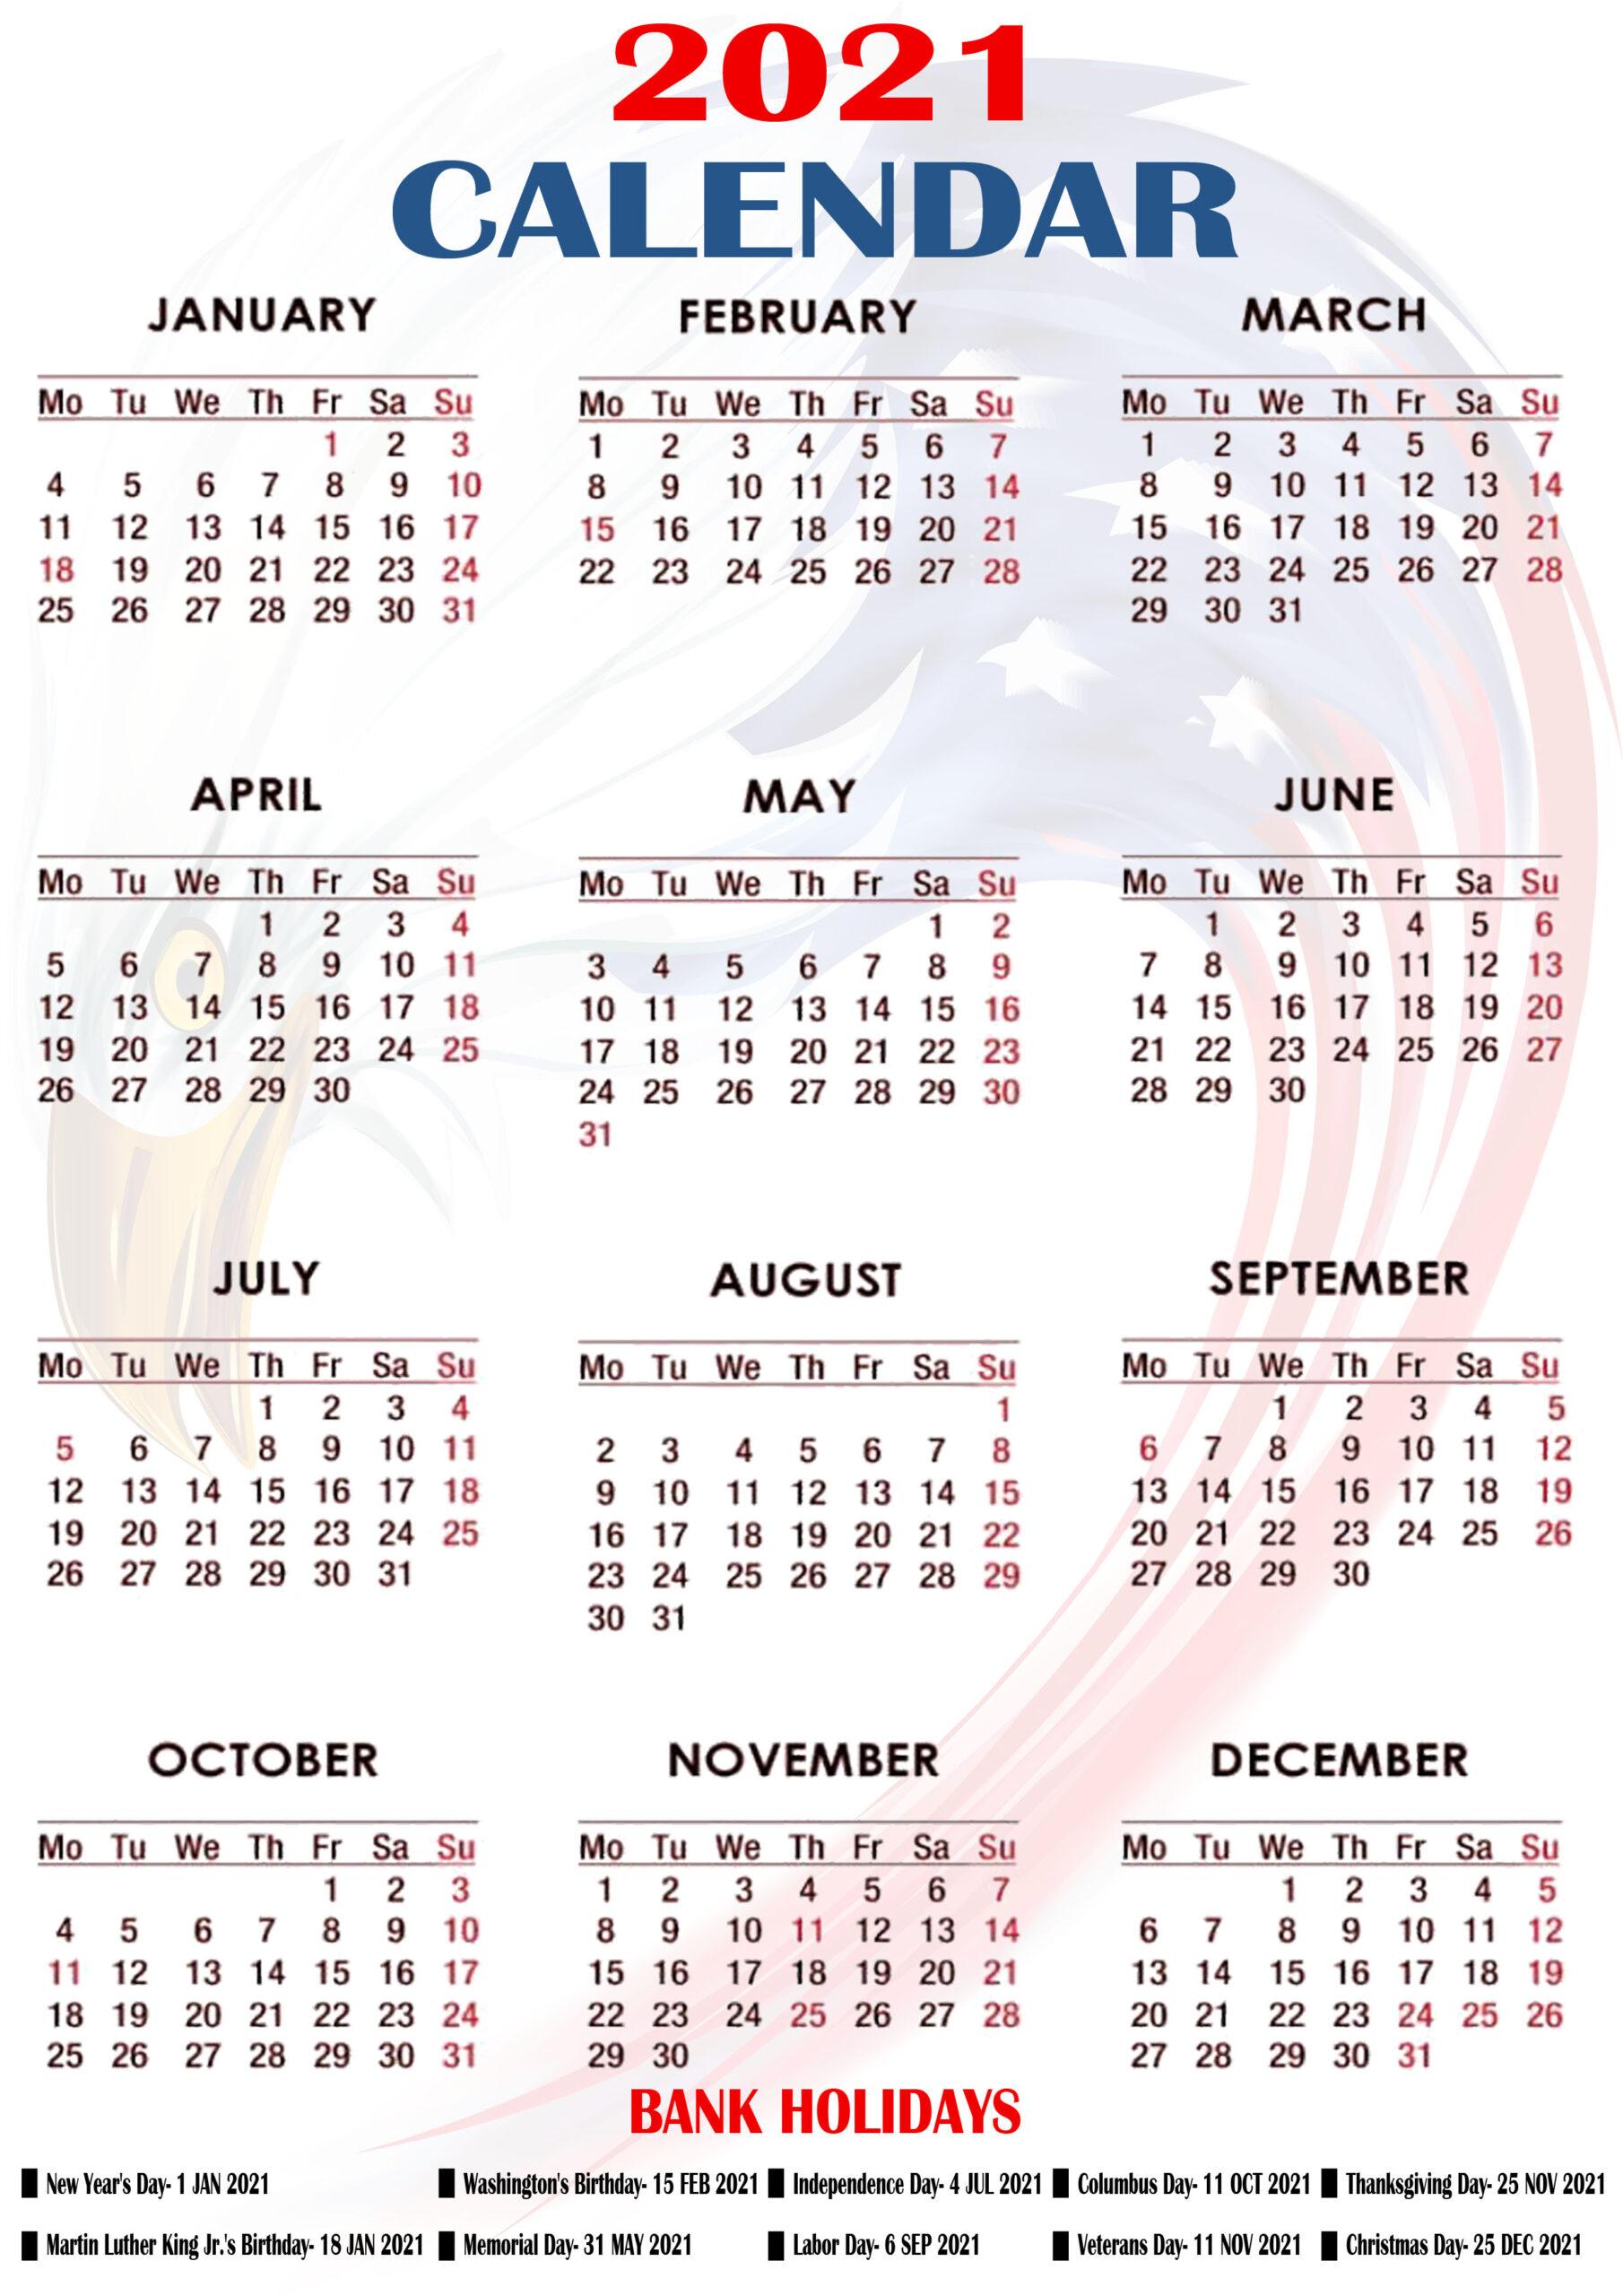 Printable 2021 Us Calendar With Holidays Federal Bank & Observation